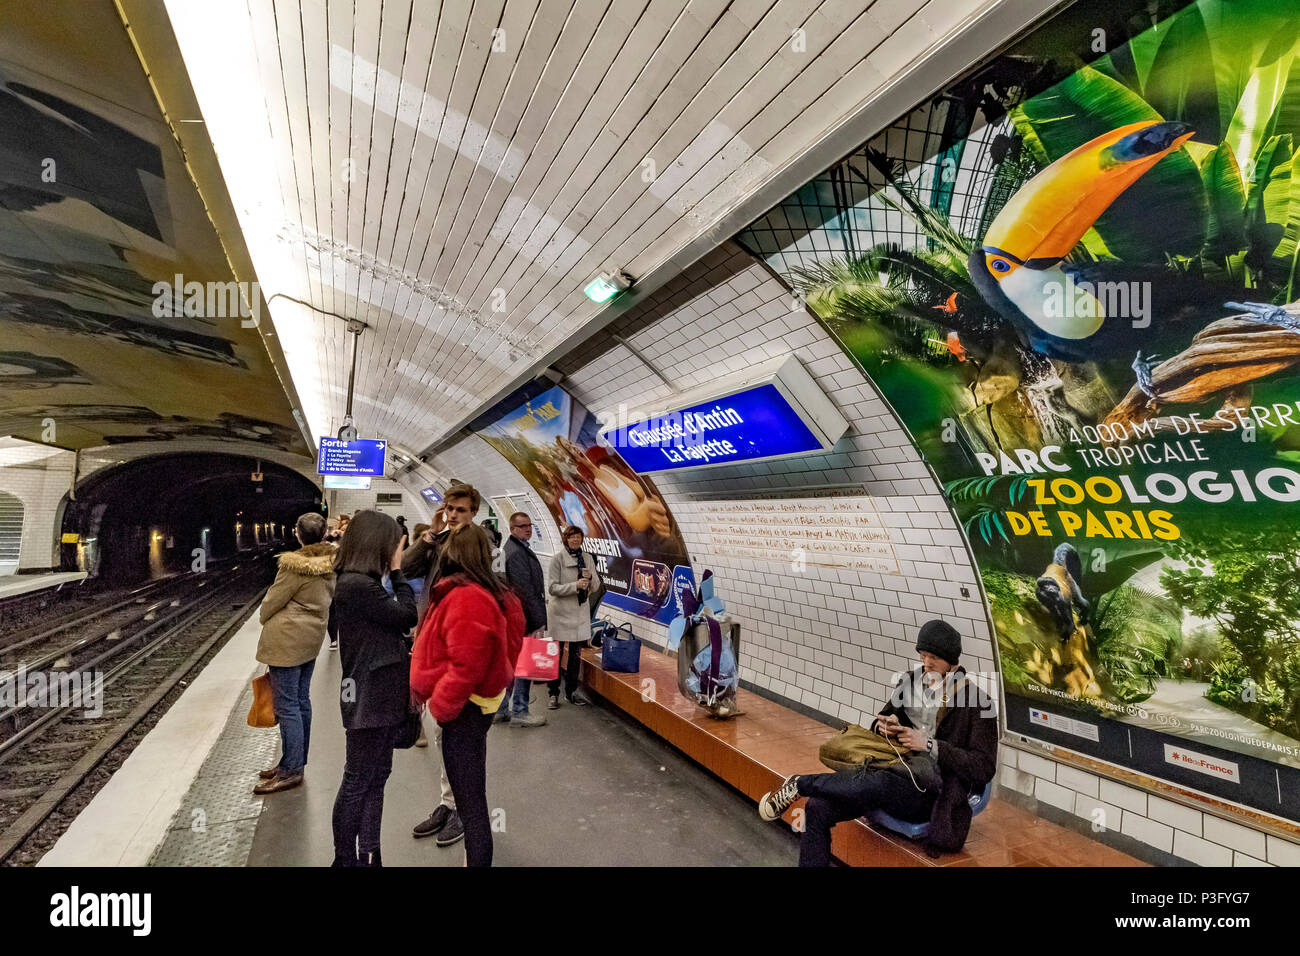 paris metro station stock photos paris metro station stock images alamy. Black Bedroom Furniture Sets. Home Design Ideas